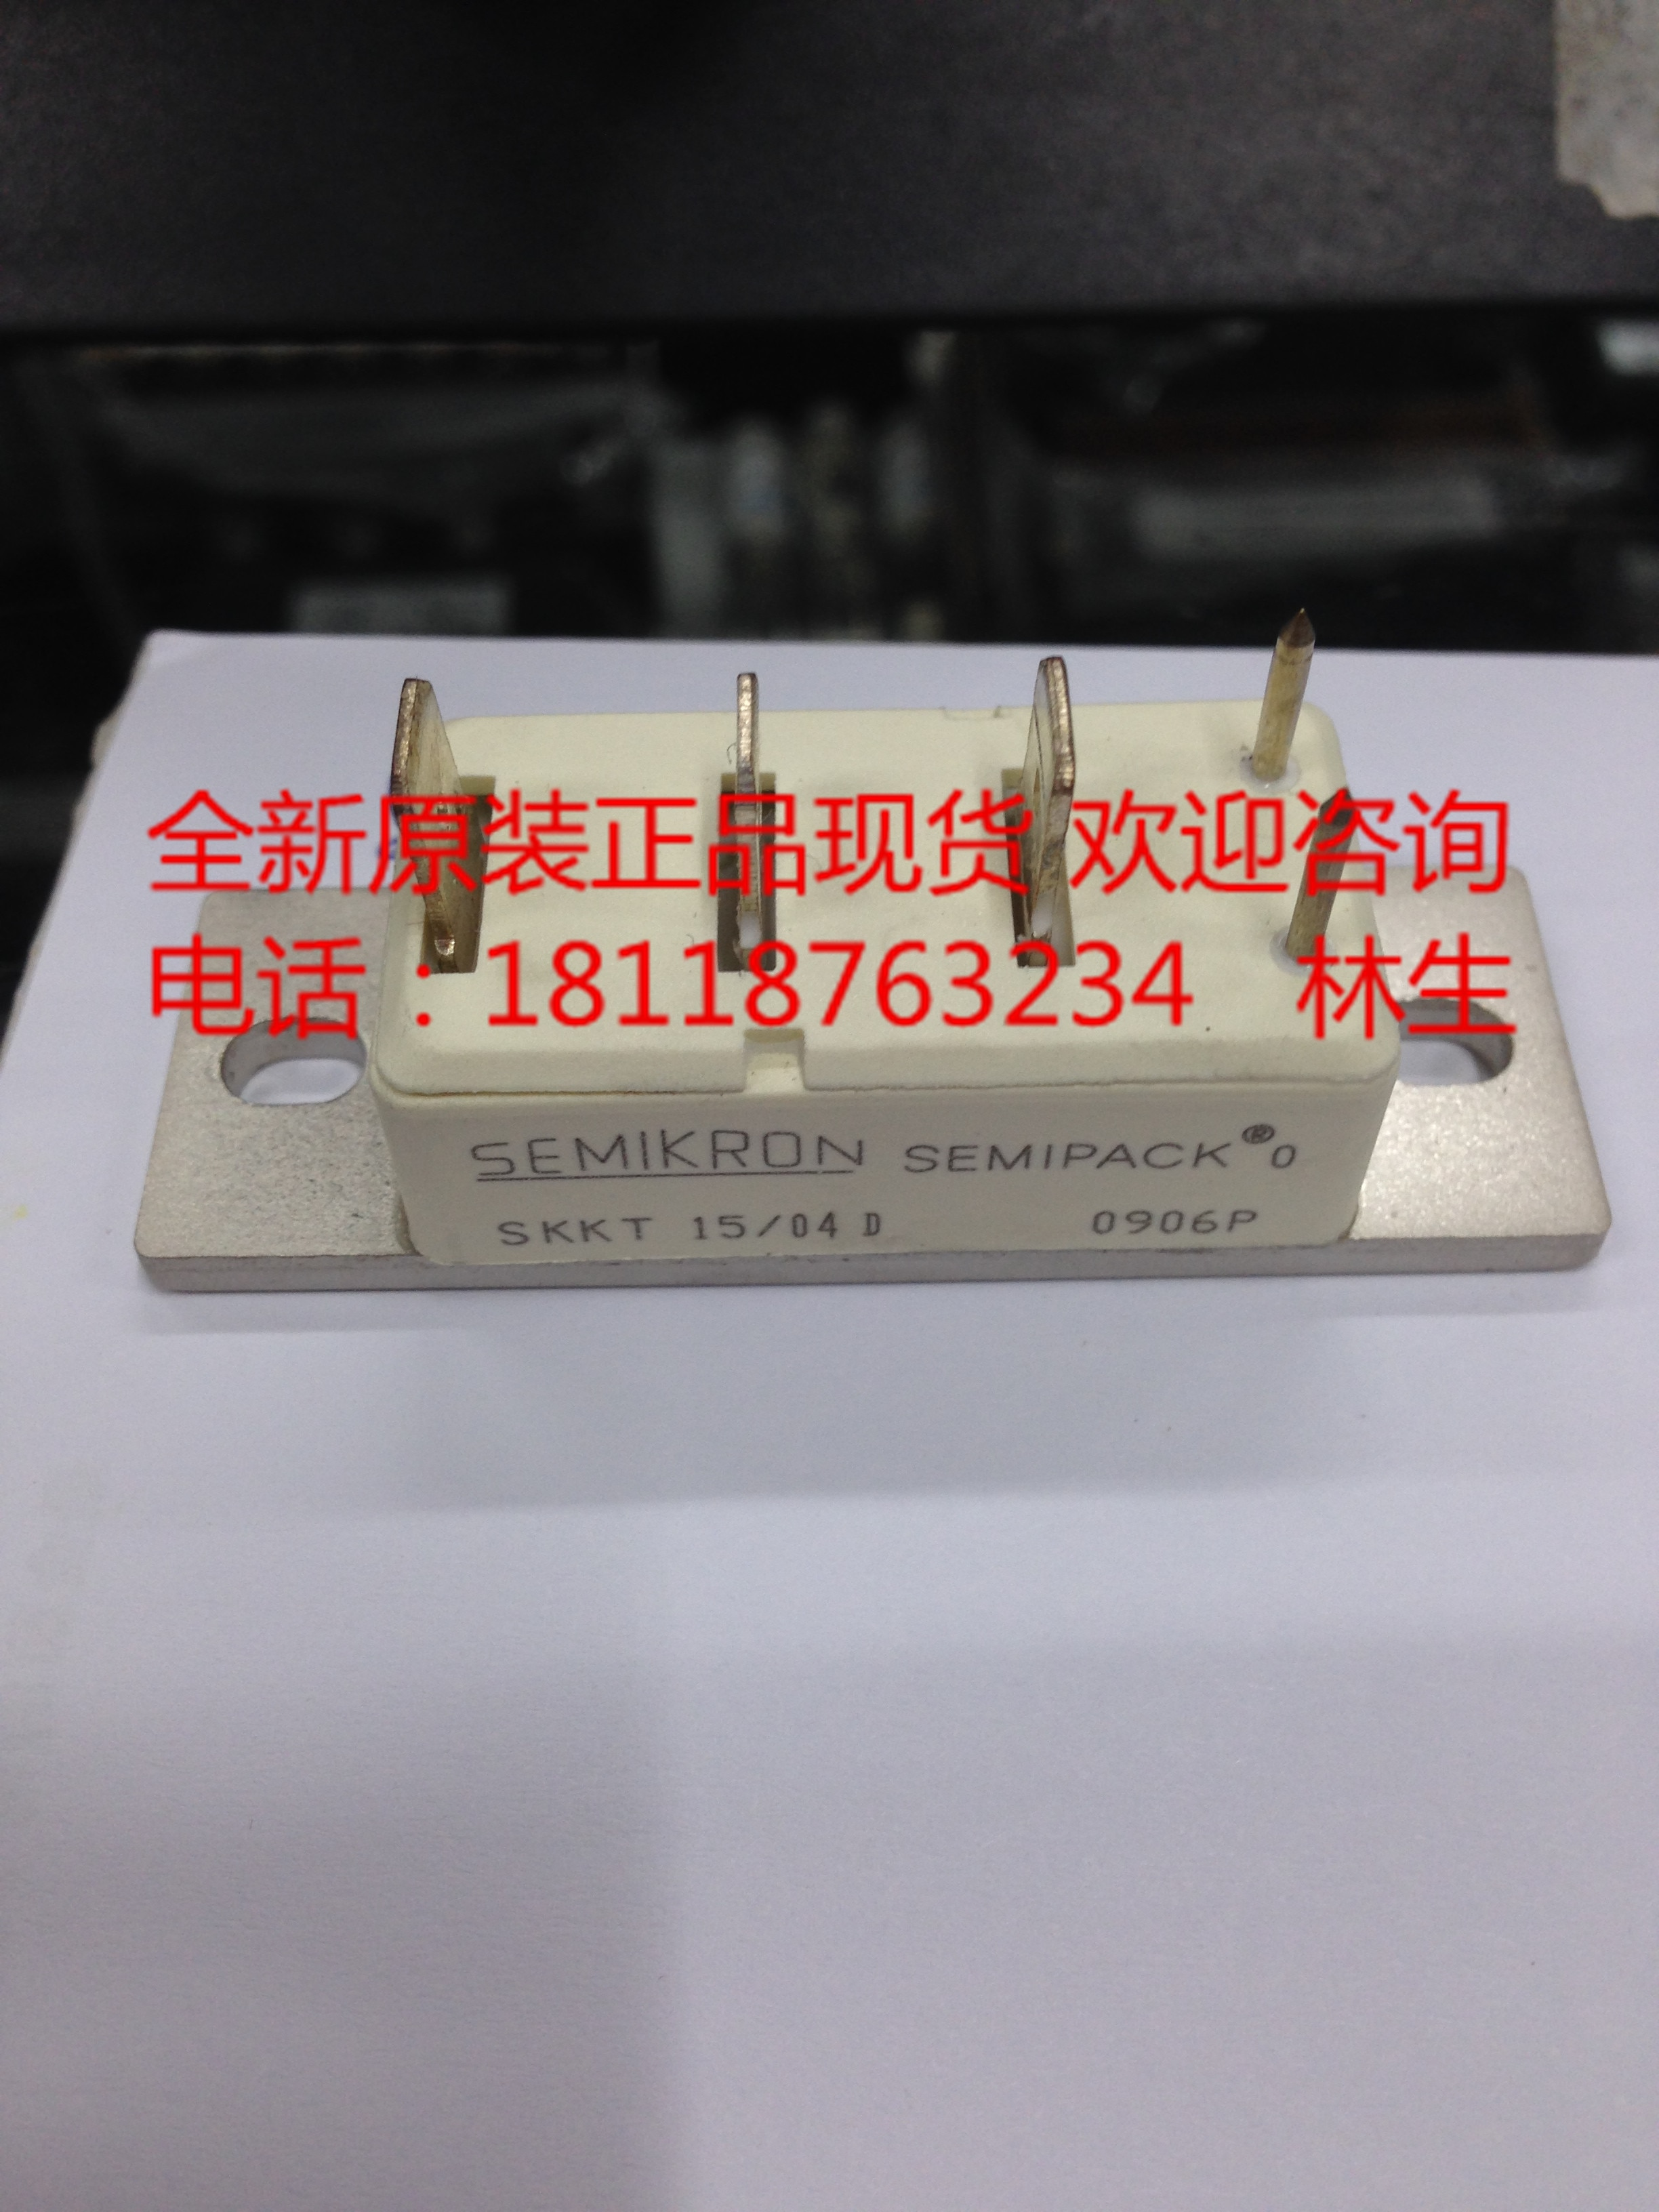 Skkd15/12 skkd15/14 skkd15/16 skkd15/06 skkd15/04 novo estoque original módulos de diodo retificador